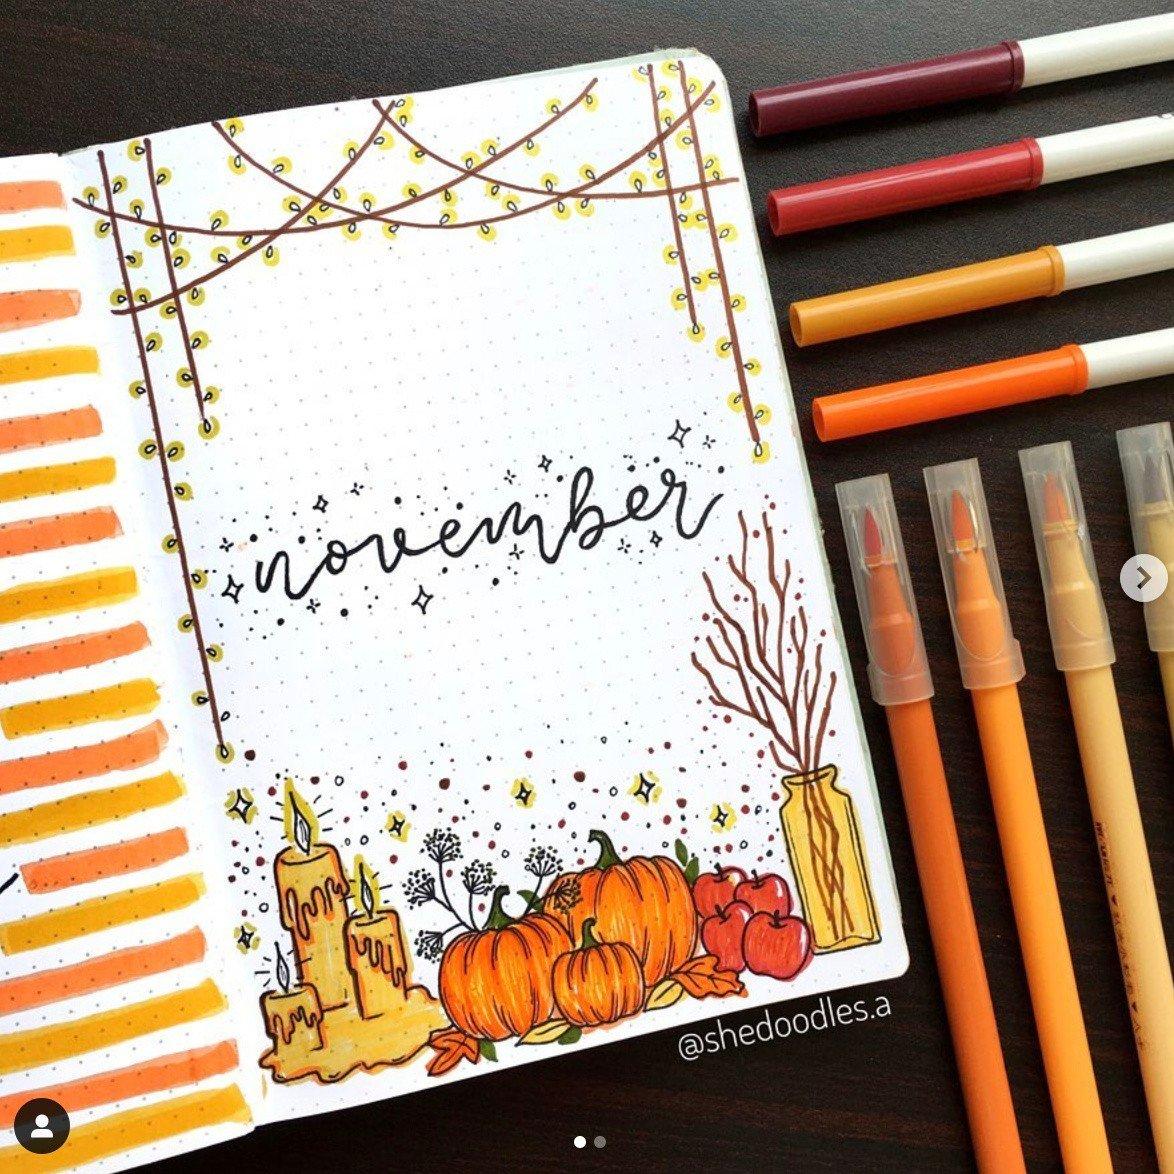 Best NOVEMBER Bullet Journal Ideas that You'll Love